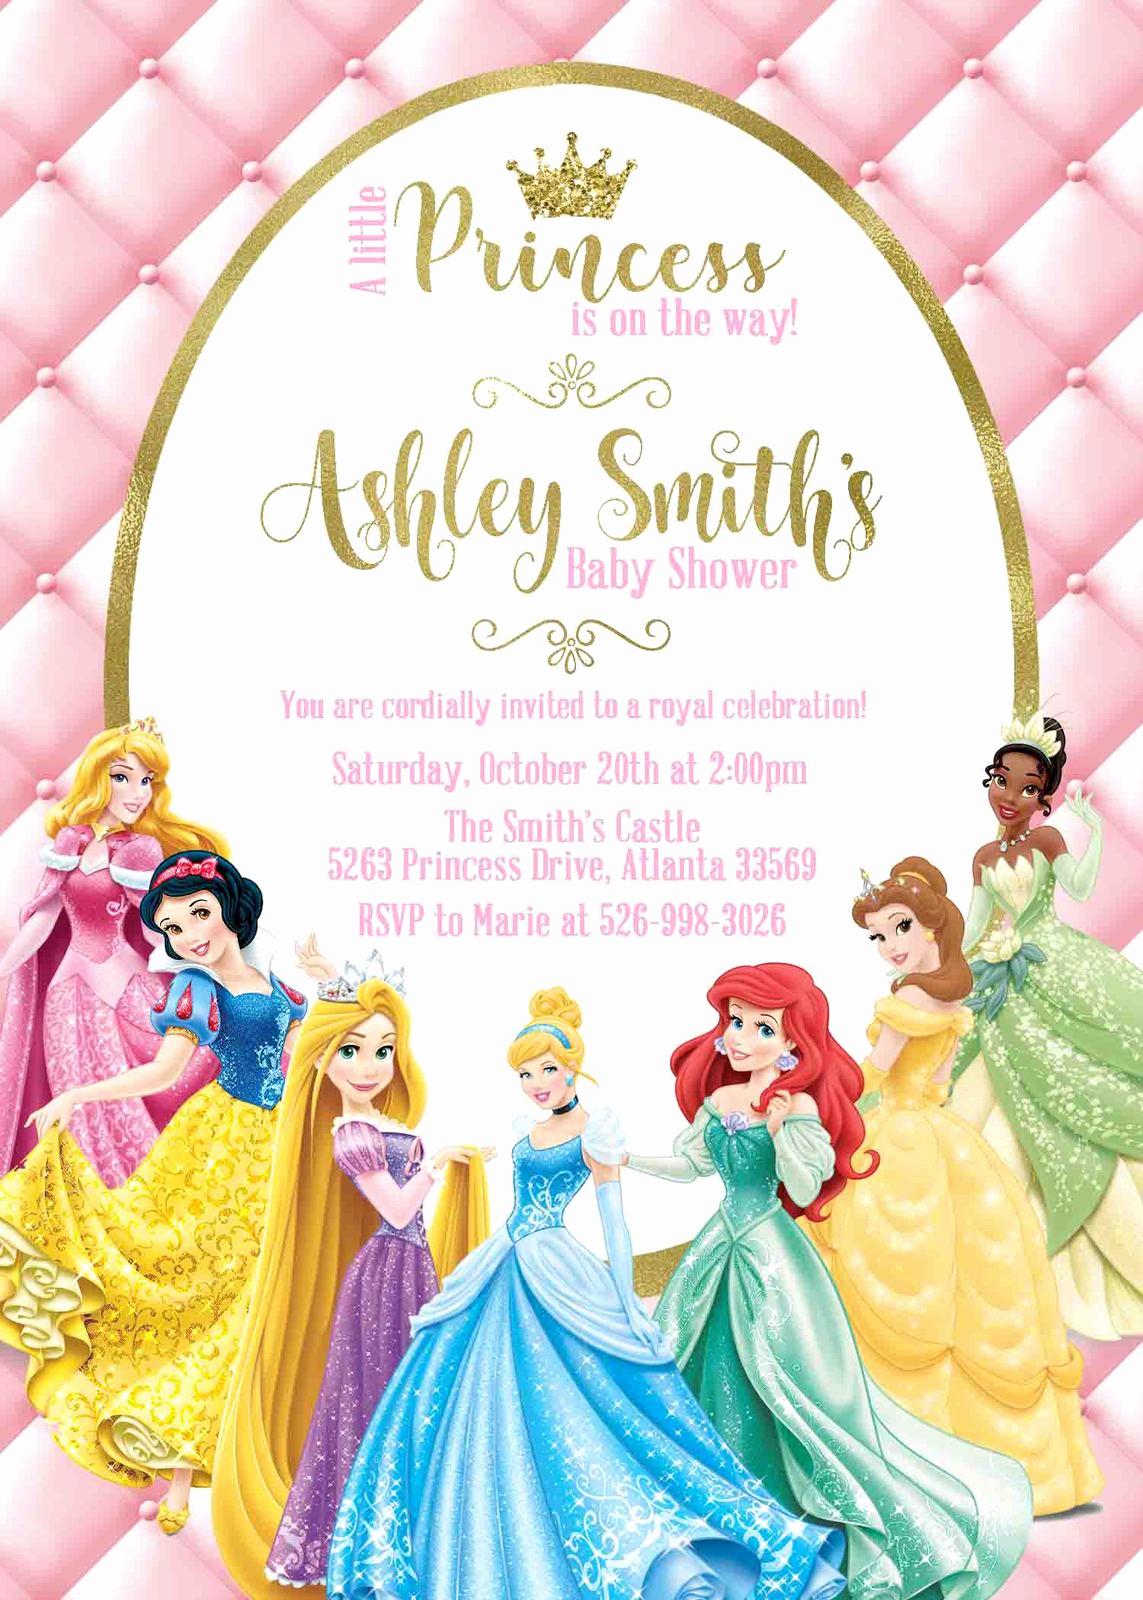 Princess Baby Shower Invitation Wording Inspirational Princess Baby Shower Invitation Disney Princess